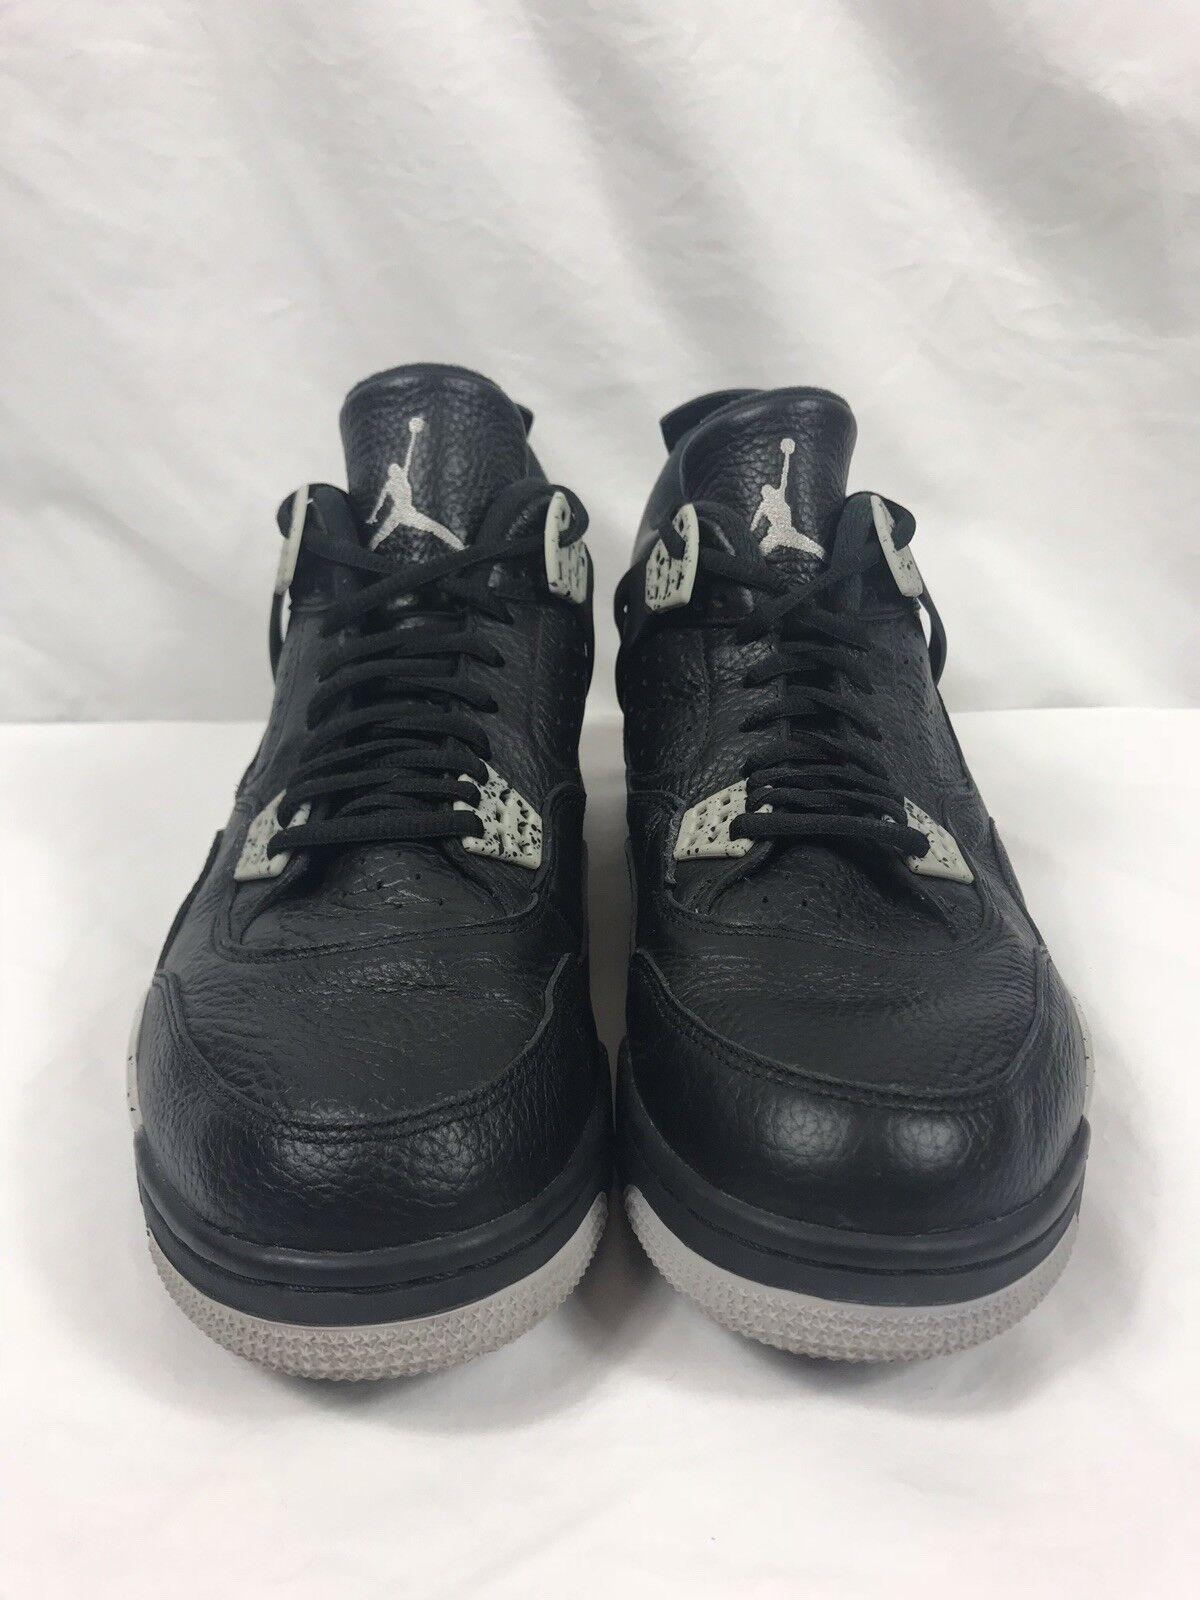 a760cabce9 Nike Men's Air Jordan Retro Oreo Size 11 Black Tech-Grey-White 2015 4  nxewnq7298-Athletic Shoes